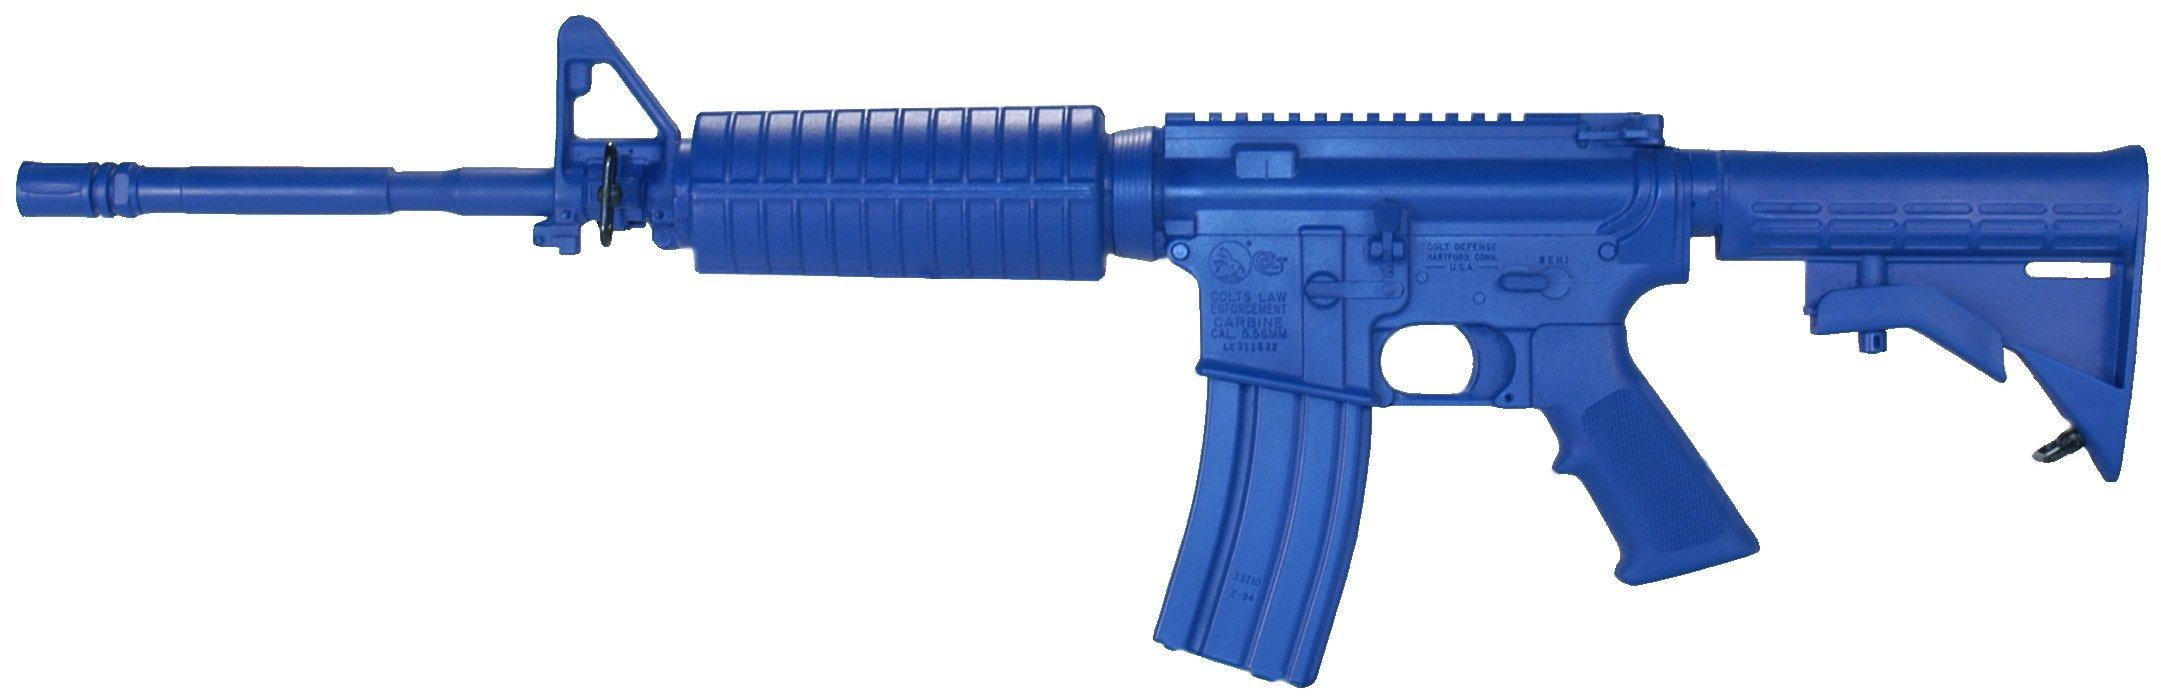 Ring's Blue Guns Training M4 Flat Top Closed Stock